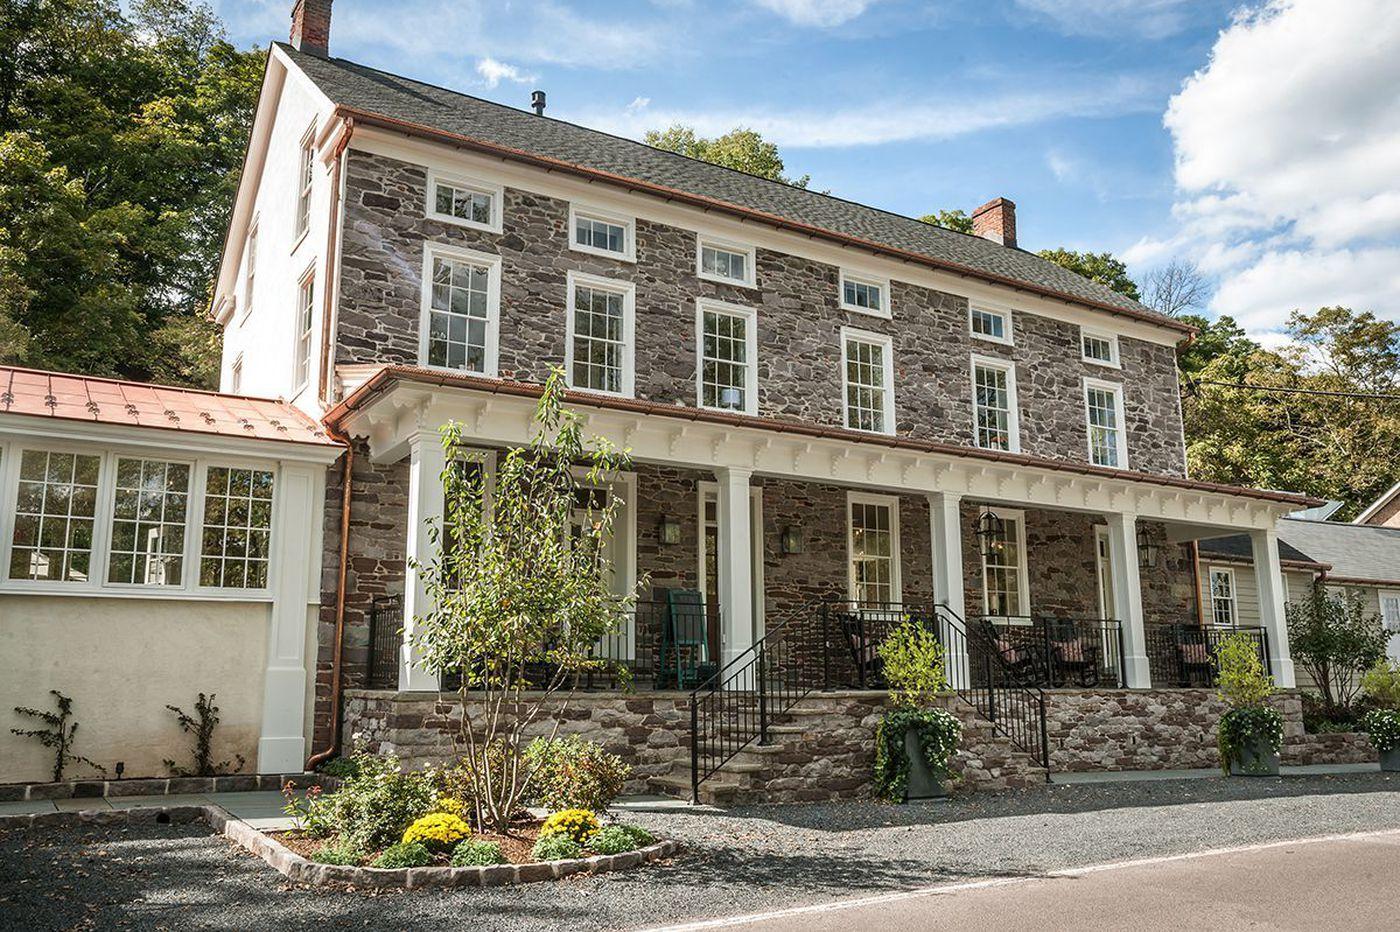 Golden Pheasant Inn, a Bucks County landmark, to be sold at auction